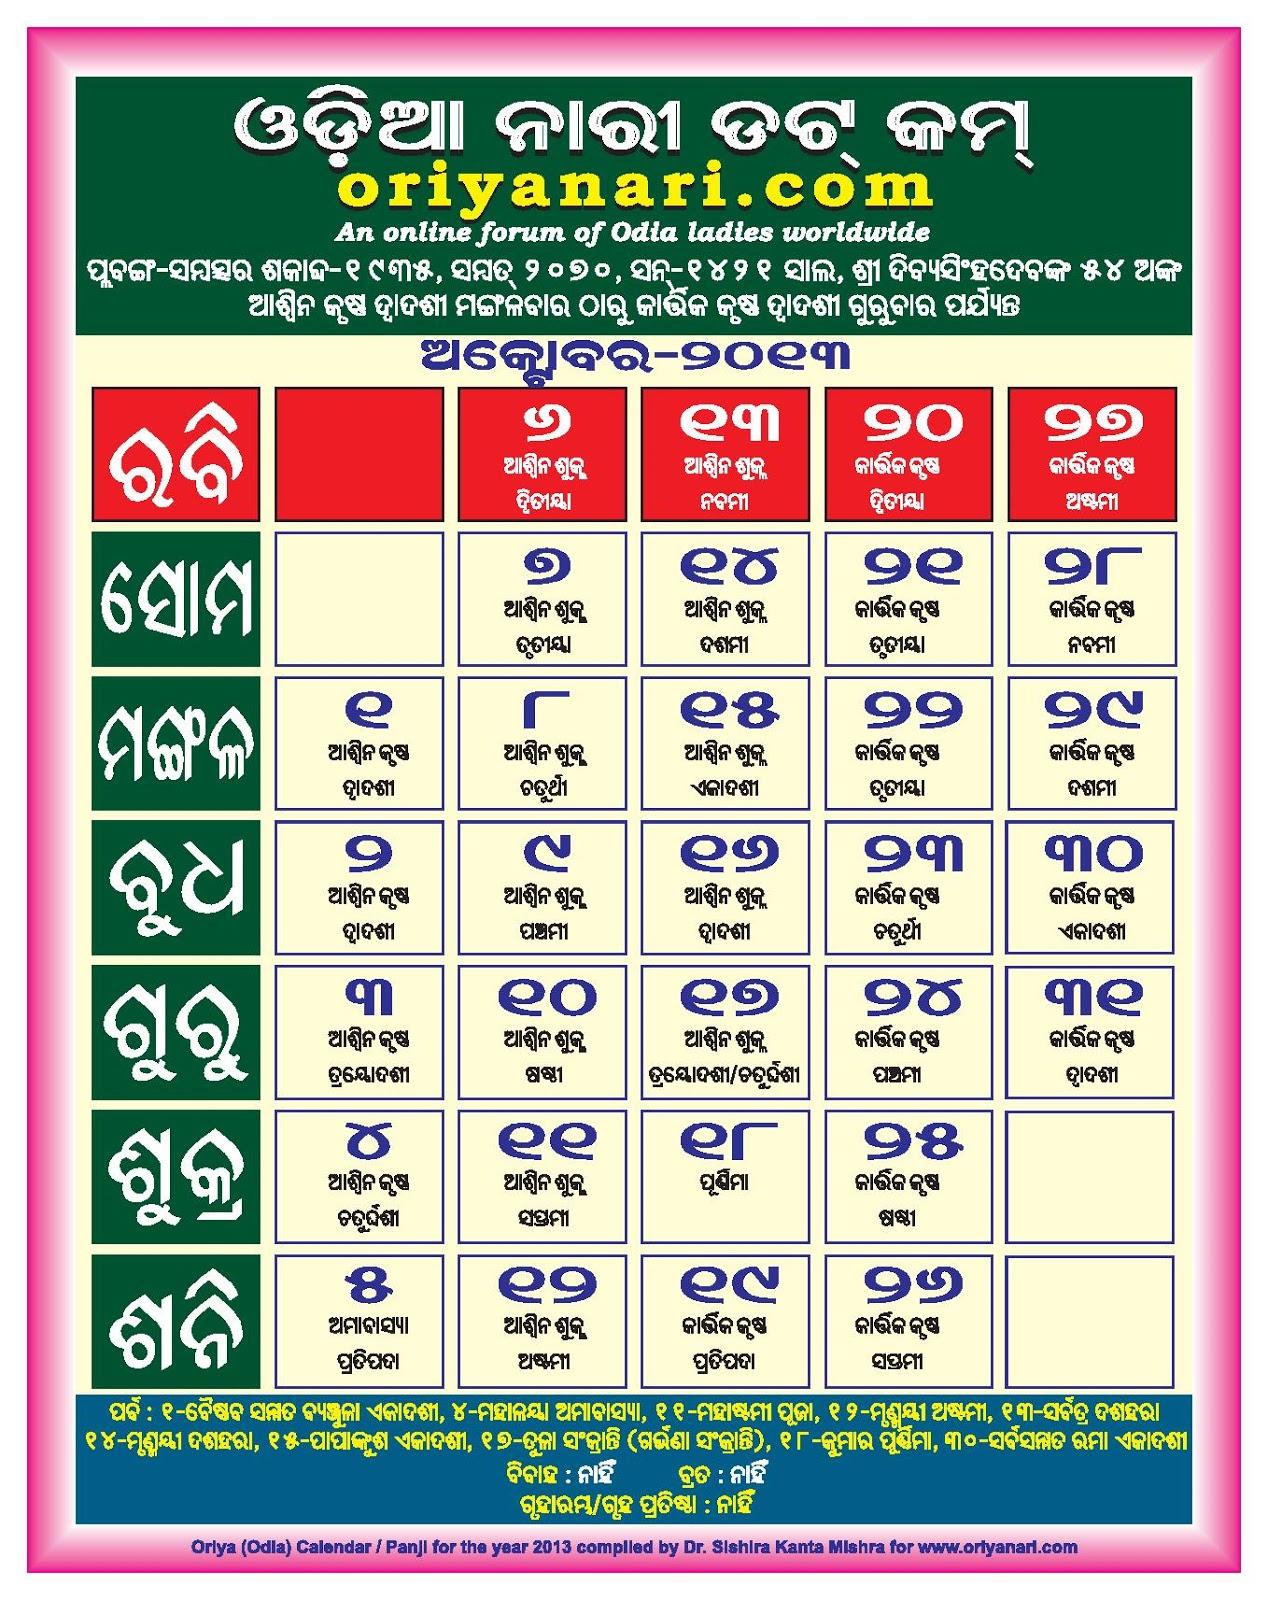 Odia Calendar 2017 | Odia Panjika 2017 | Odia Rasifala 2017